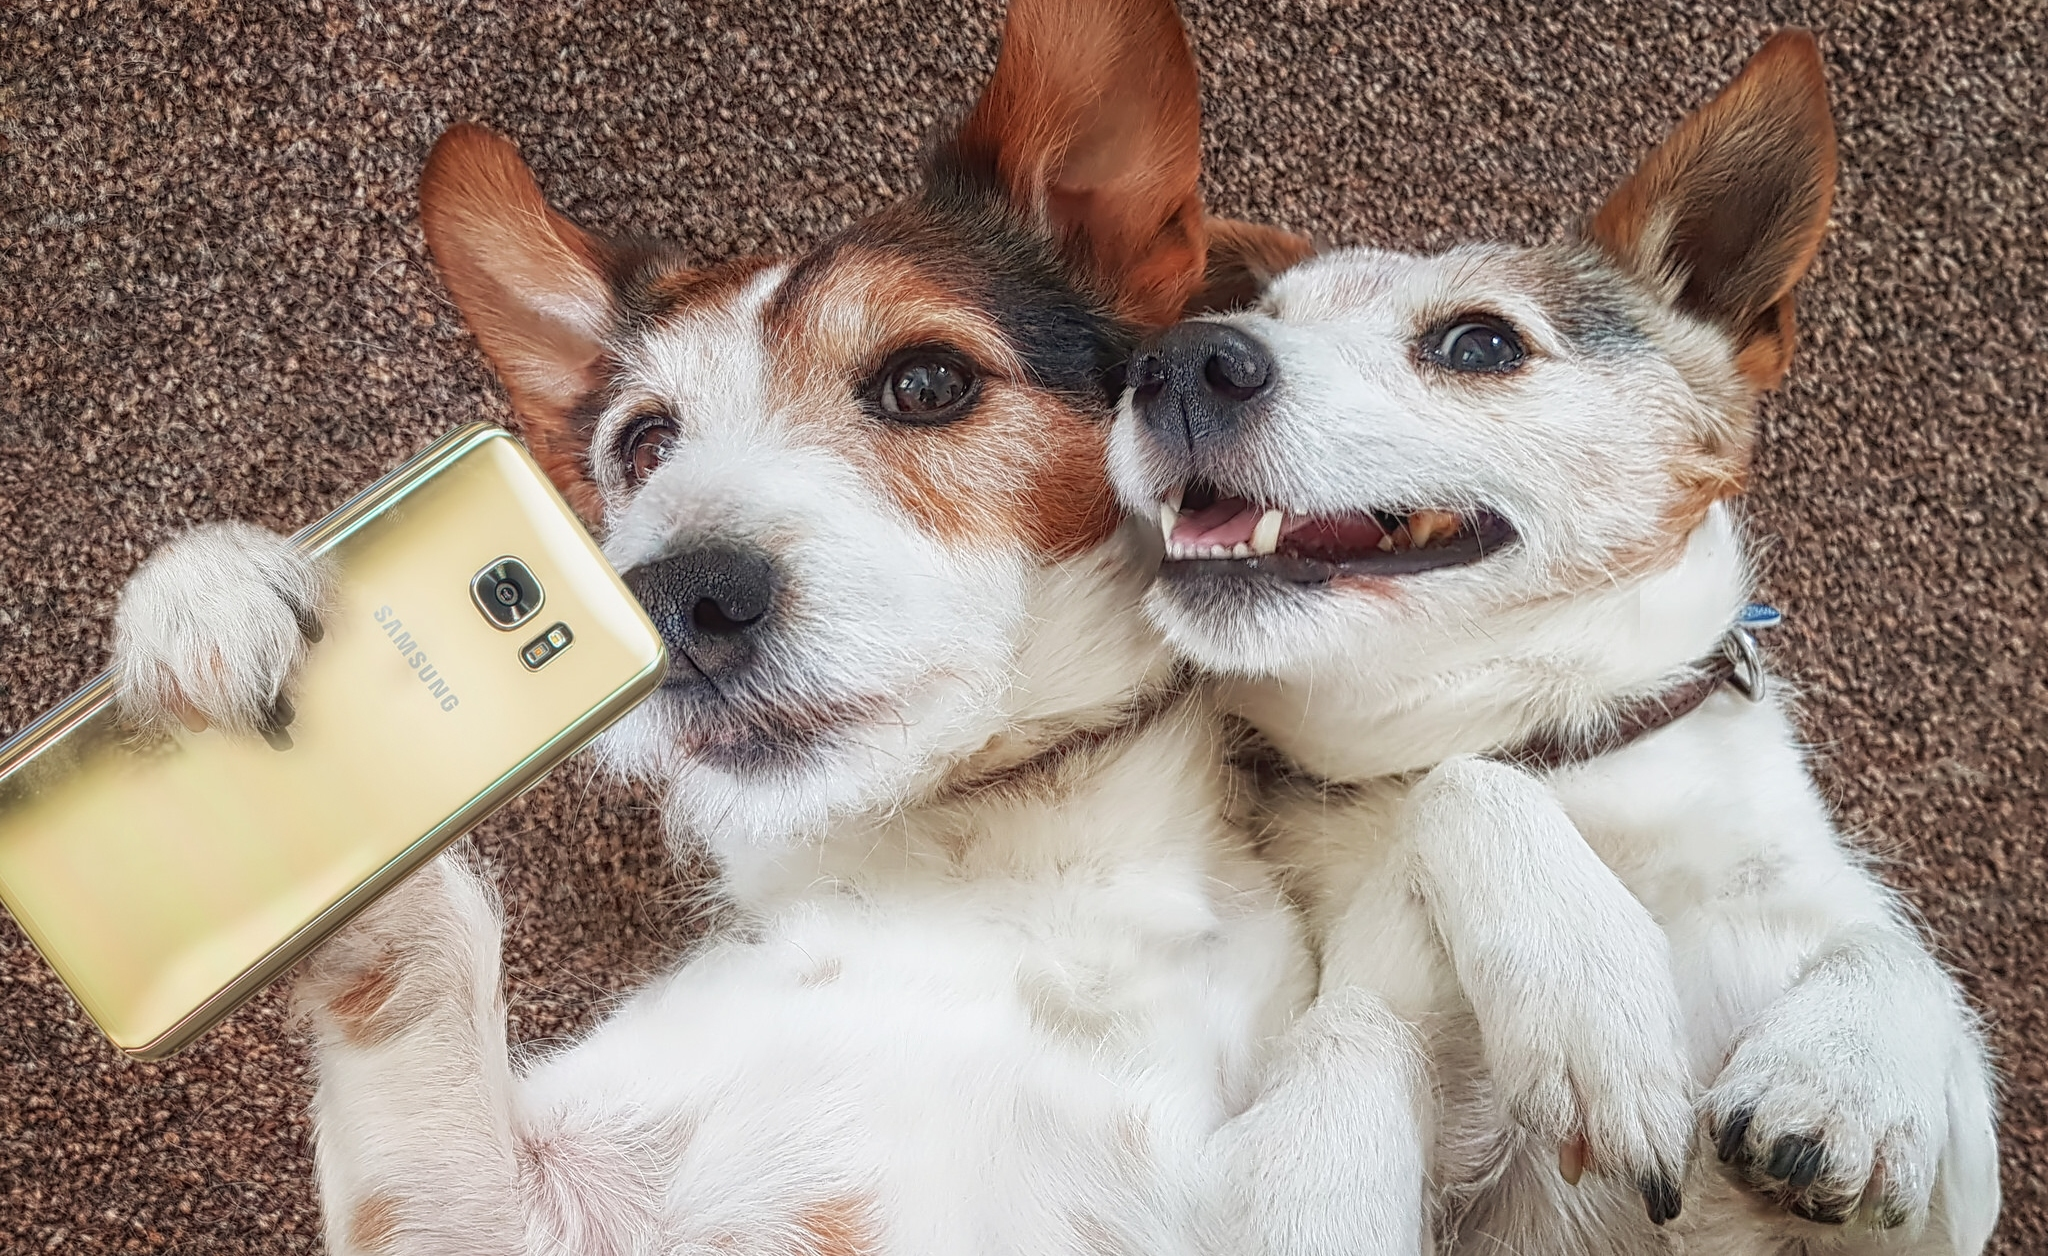 Картинки с юмором про собак, спб для посткроссинга